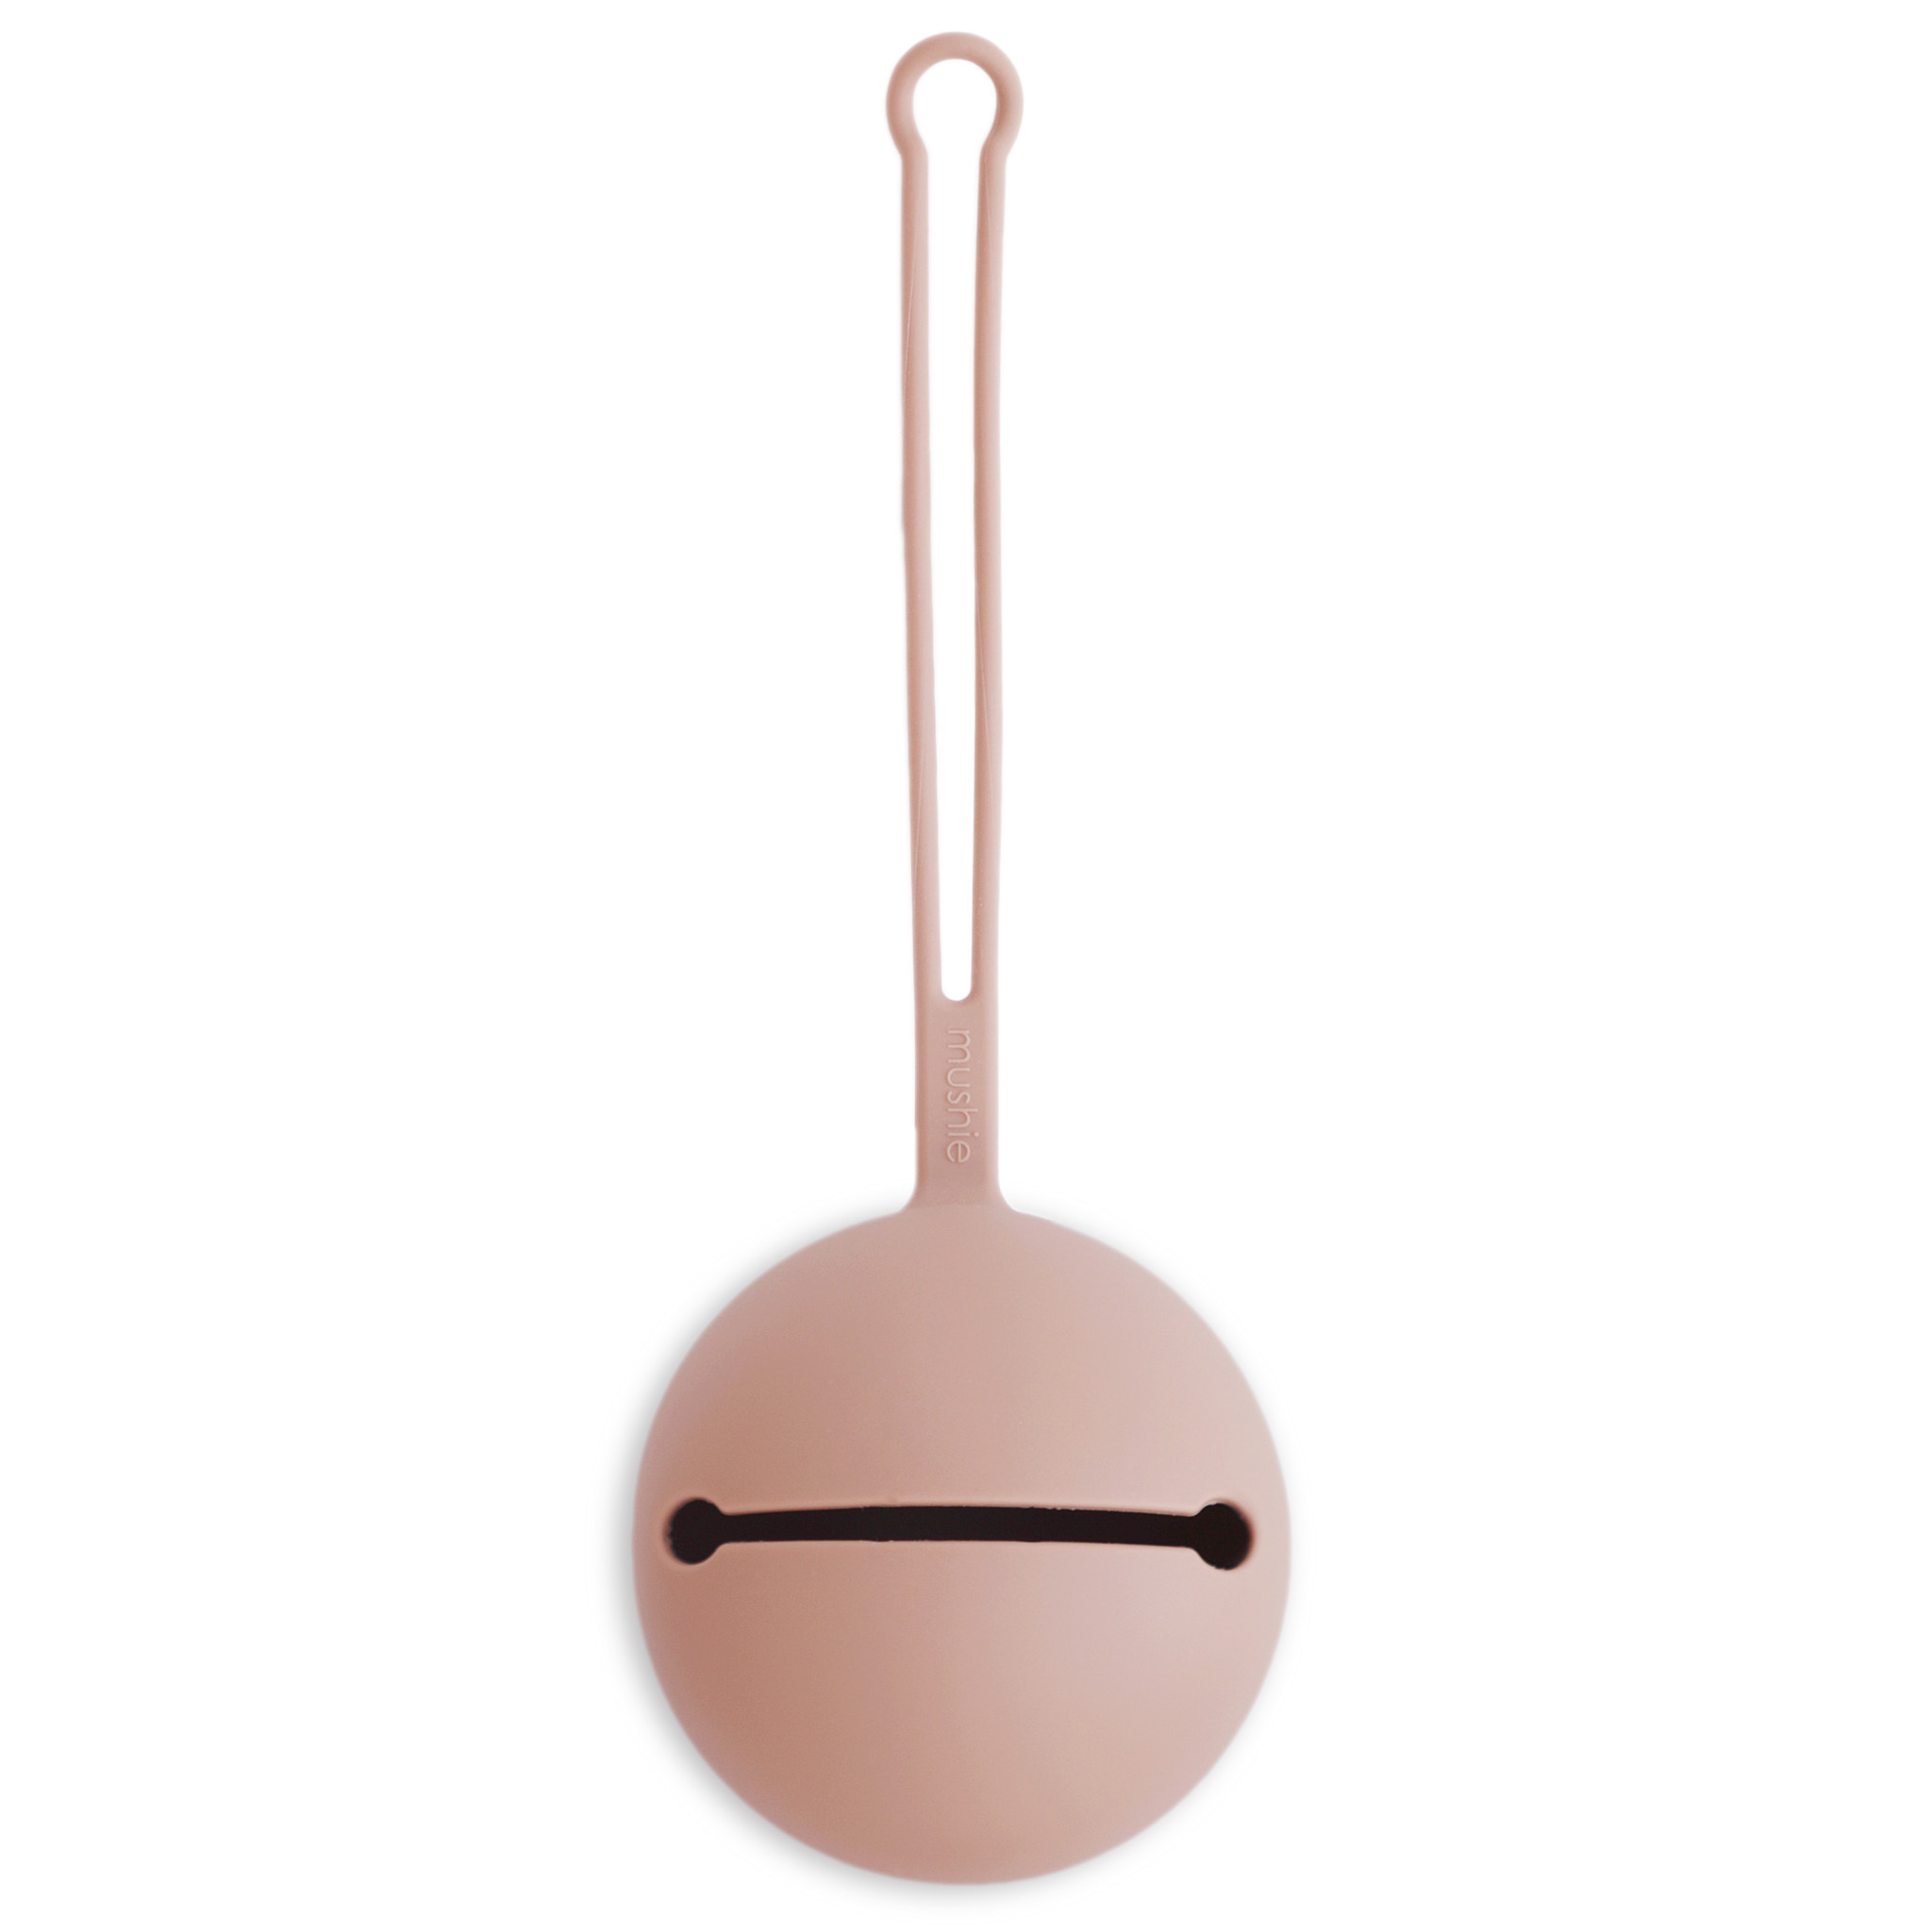 Silicone pacifier case blush-1